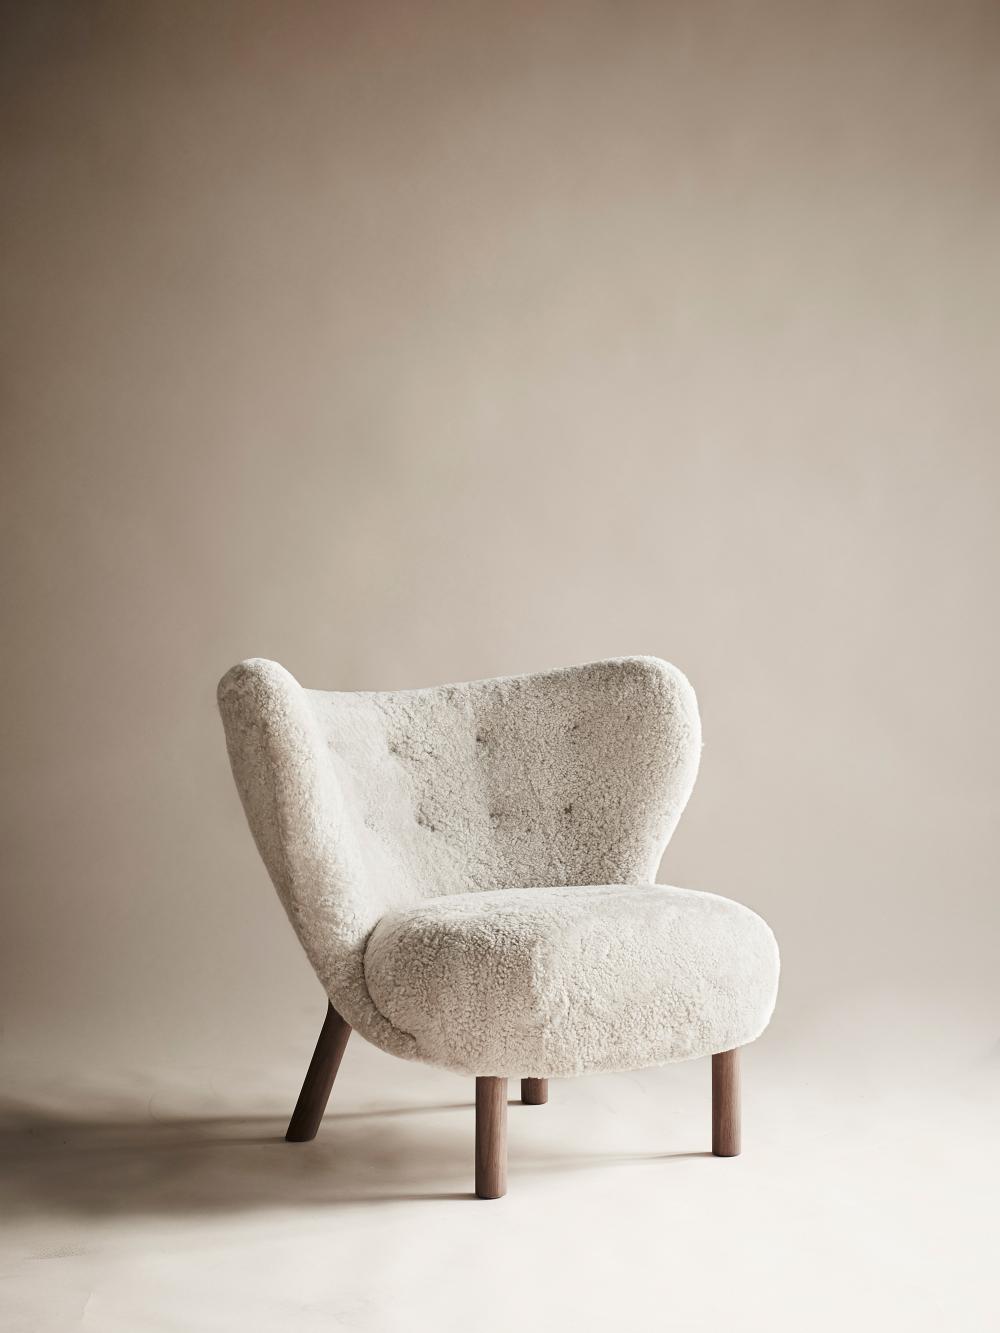 Little Petra VB1 – Sheepskin – Oiled Walnut in 2020 | Small